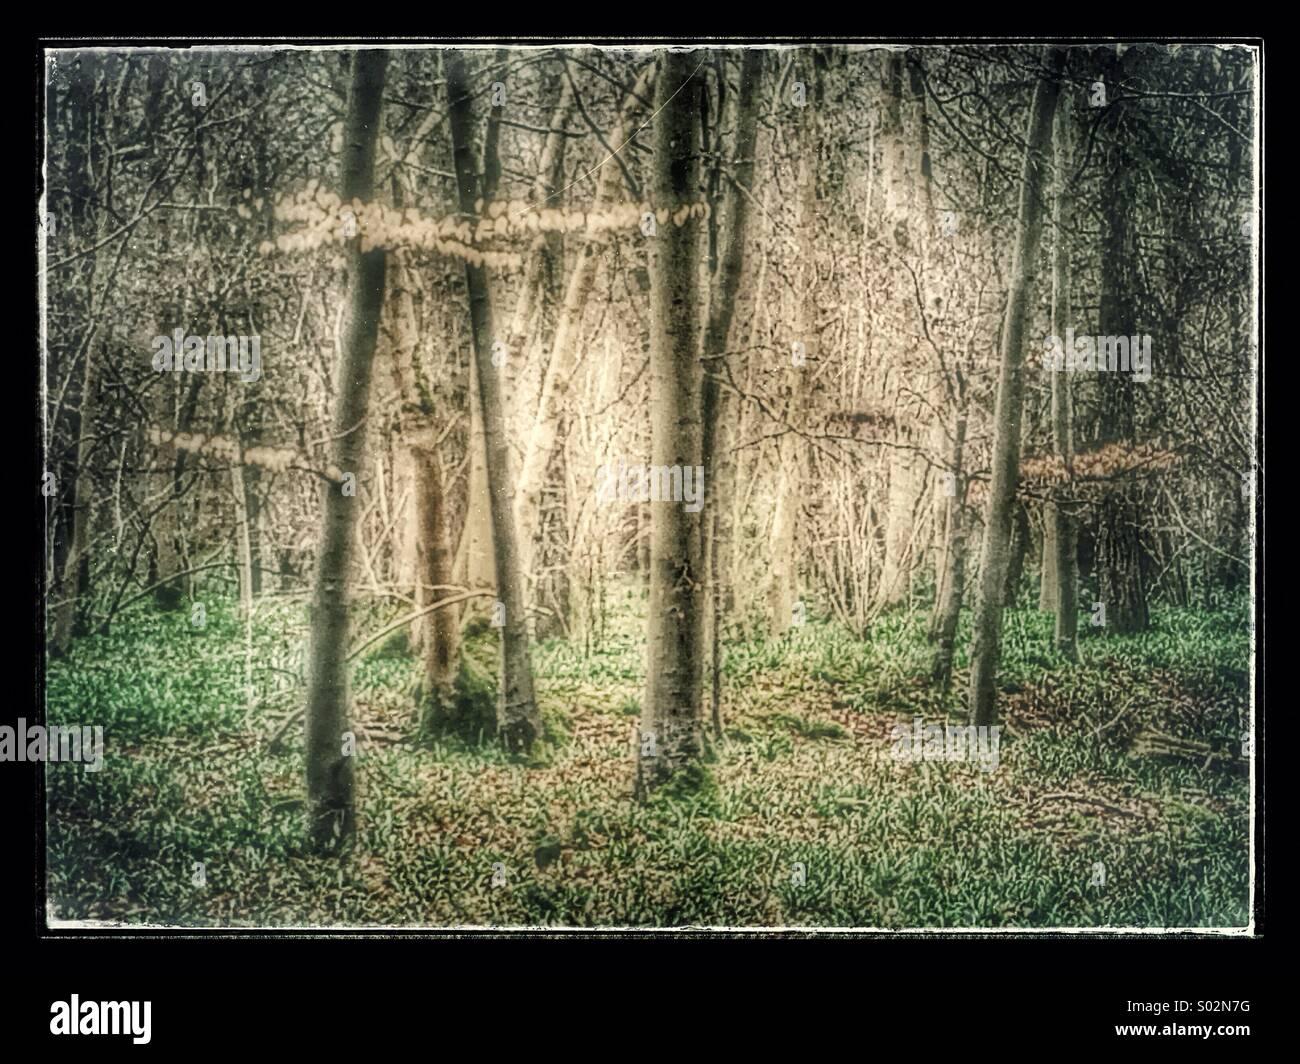 Atmospheric Ancient British woodland - Stock Image